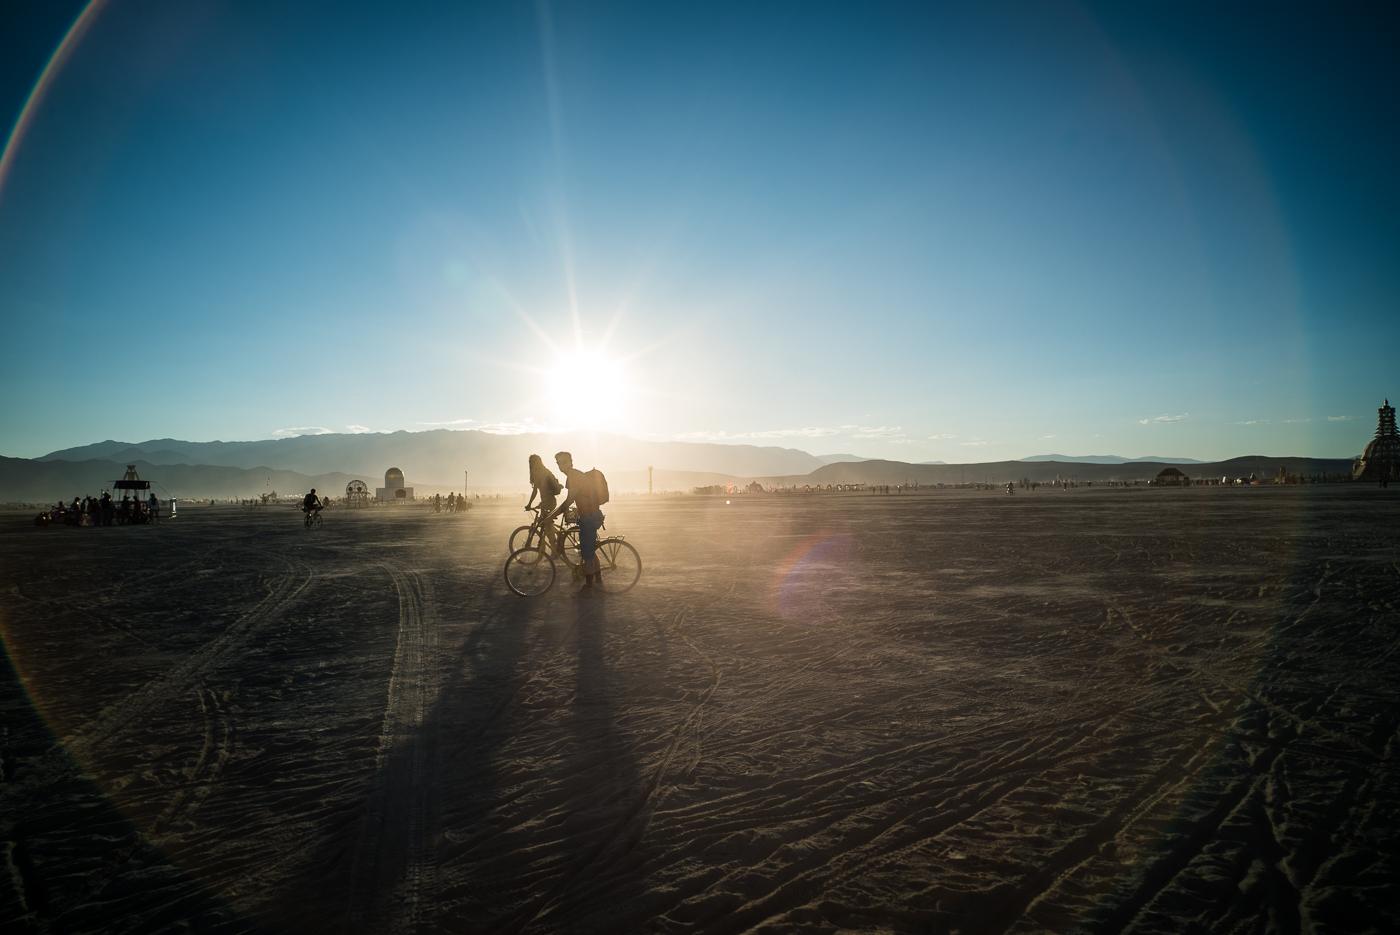 Bike Ride, Burning Man 2014: In Dust We Trust - Photos of a Dusty Playa